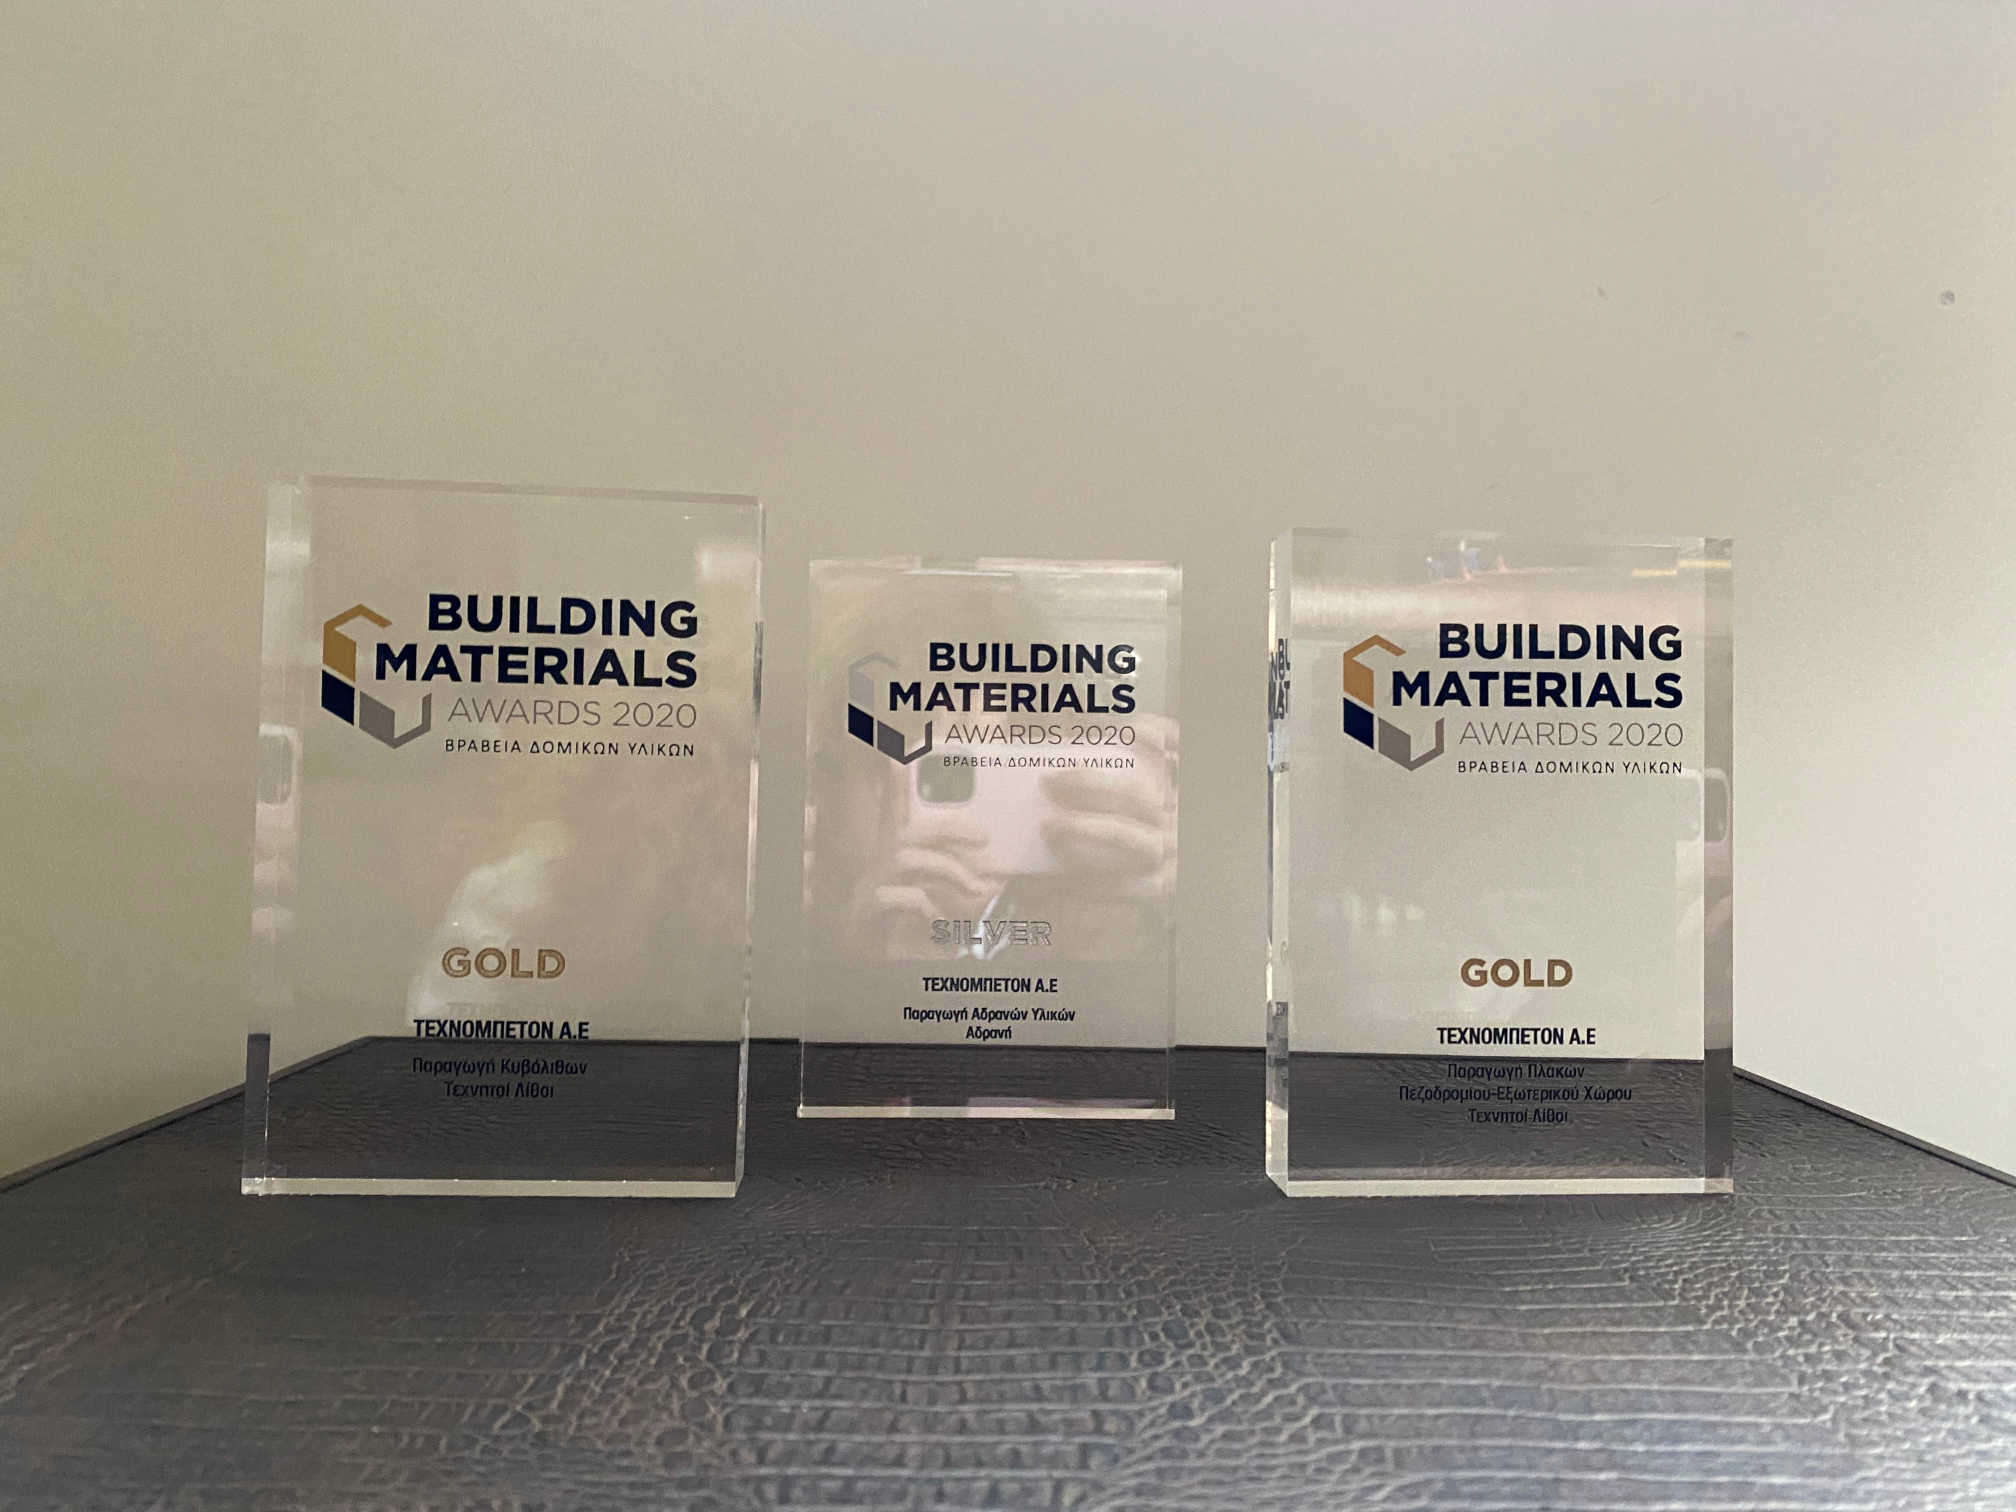 tehnobeton building materials awards 2020 1